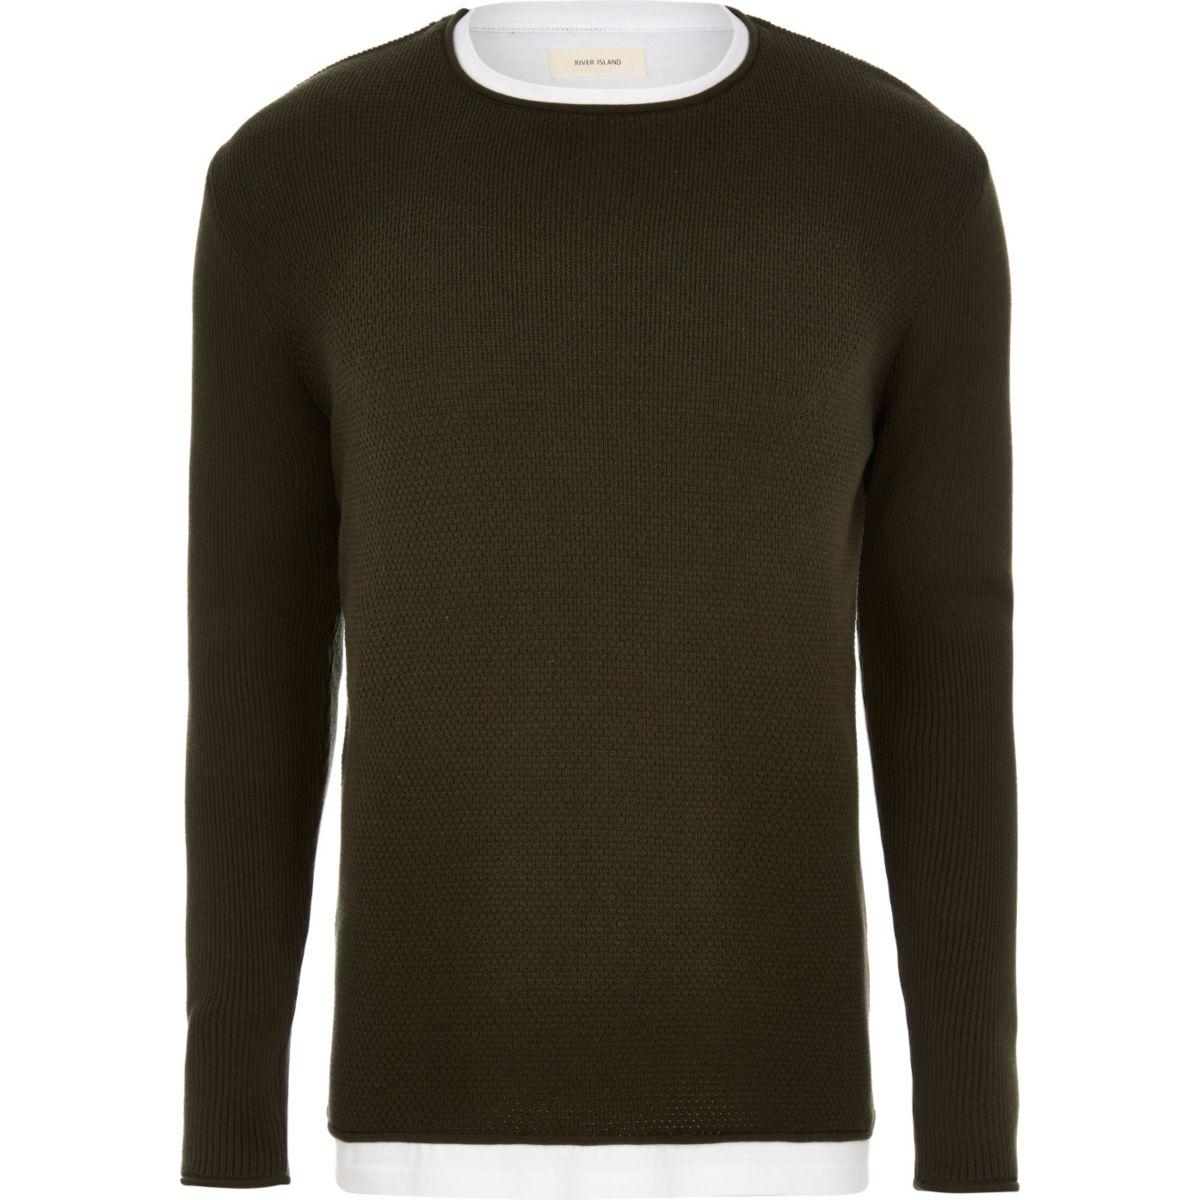 Dark green layered longline jumper